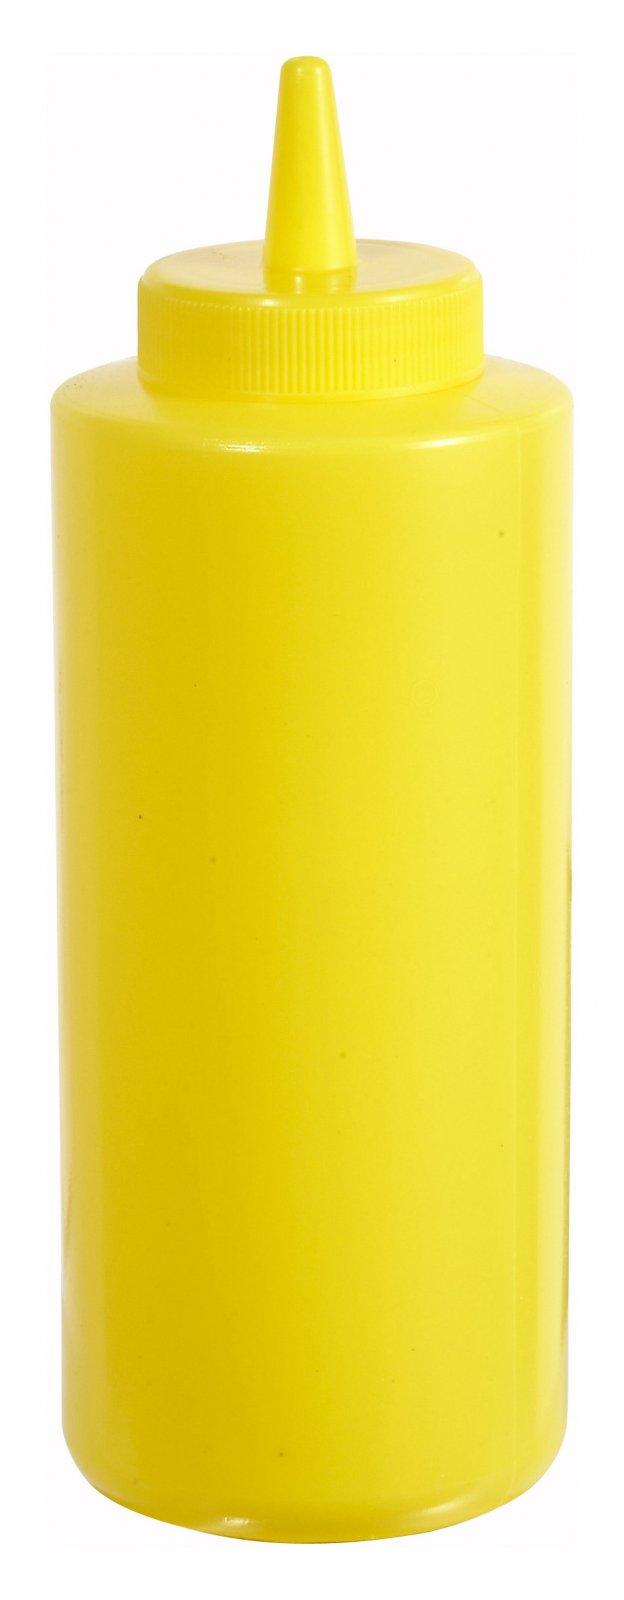 12oz Squeeze Bottles, Yellow, 6pcs/pk